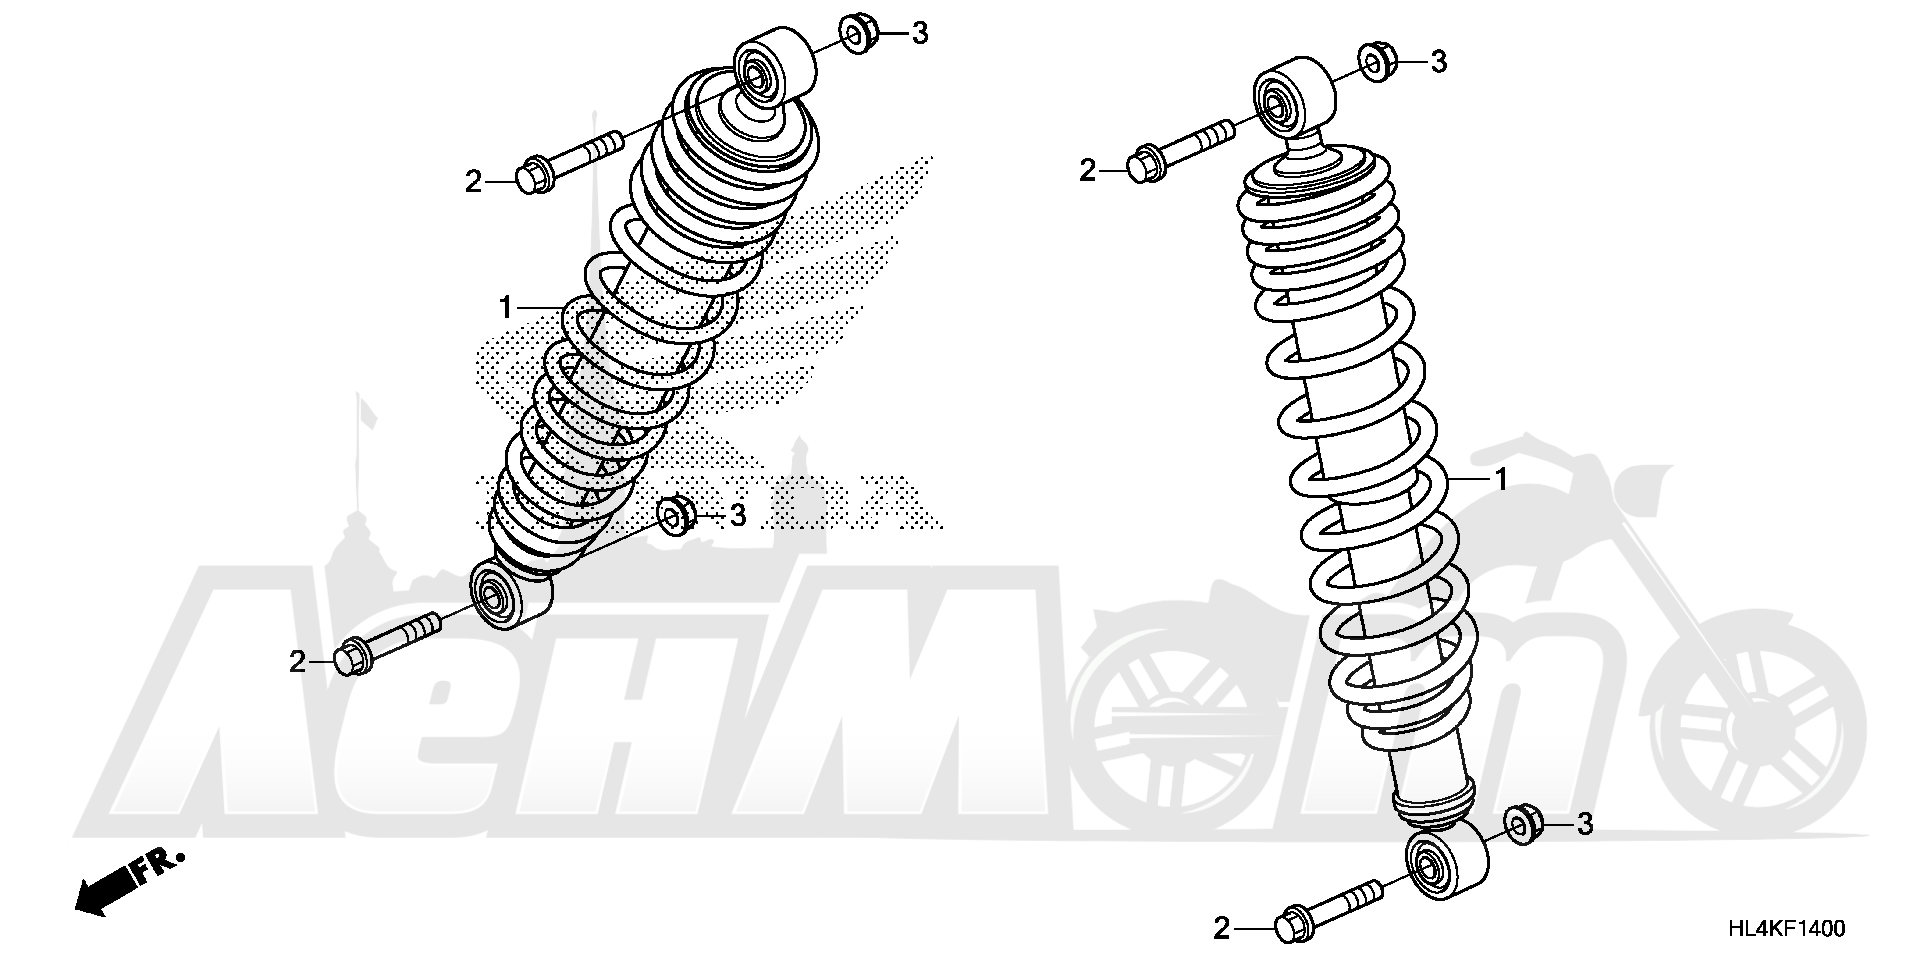 Запчасти для Квадроцикла Honda 2019 SXS1000M3P Раздел: FRONT CUSHION (1) | перед подкладка (1)